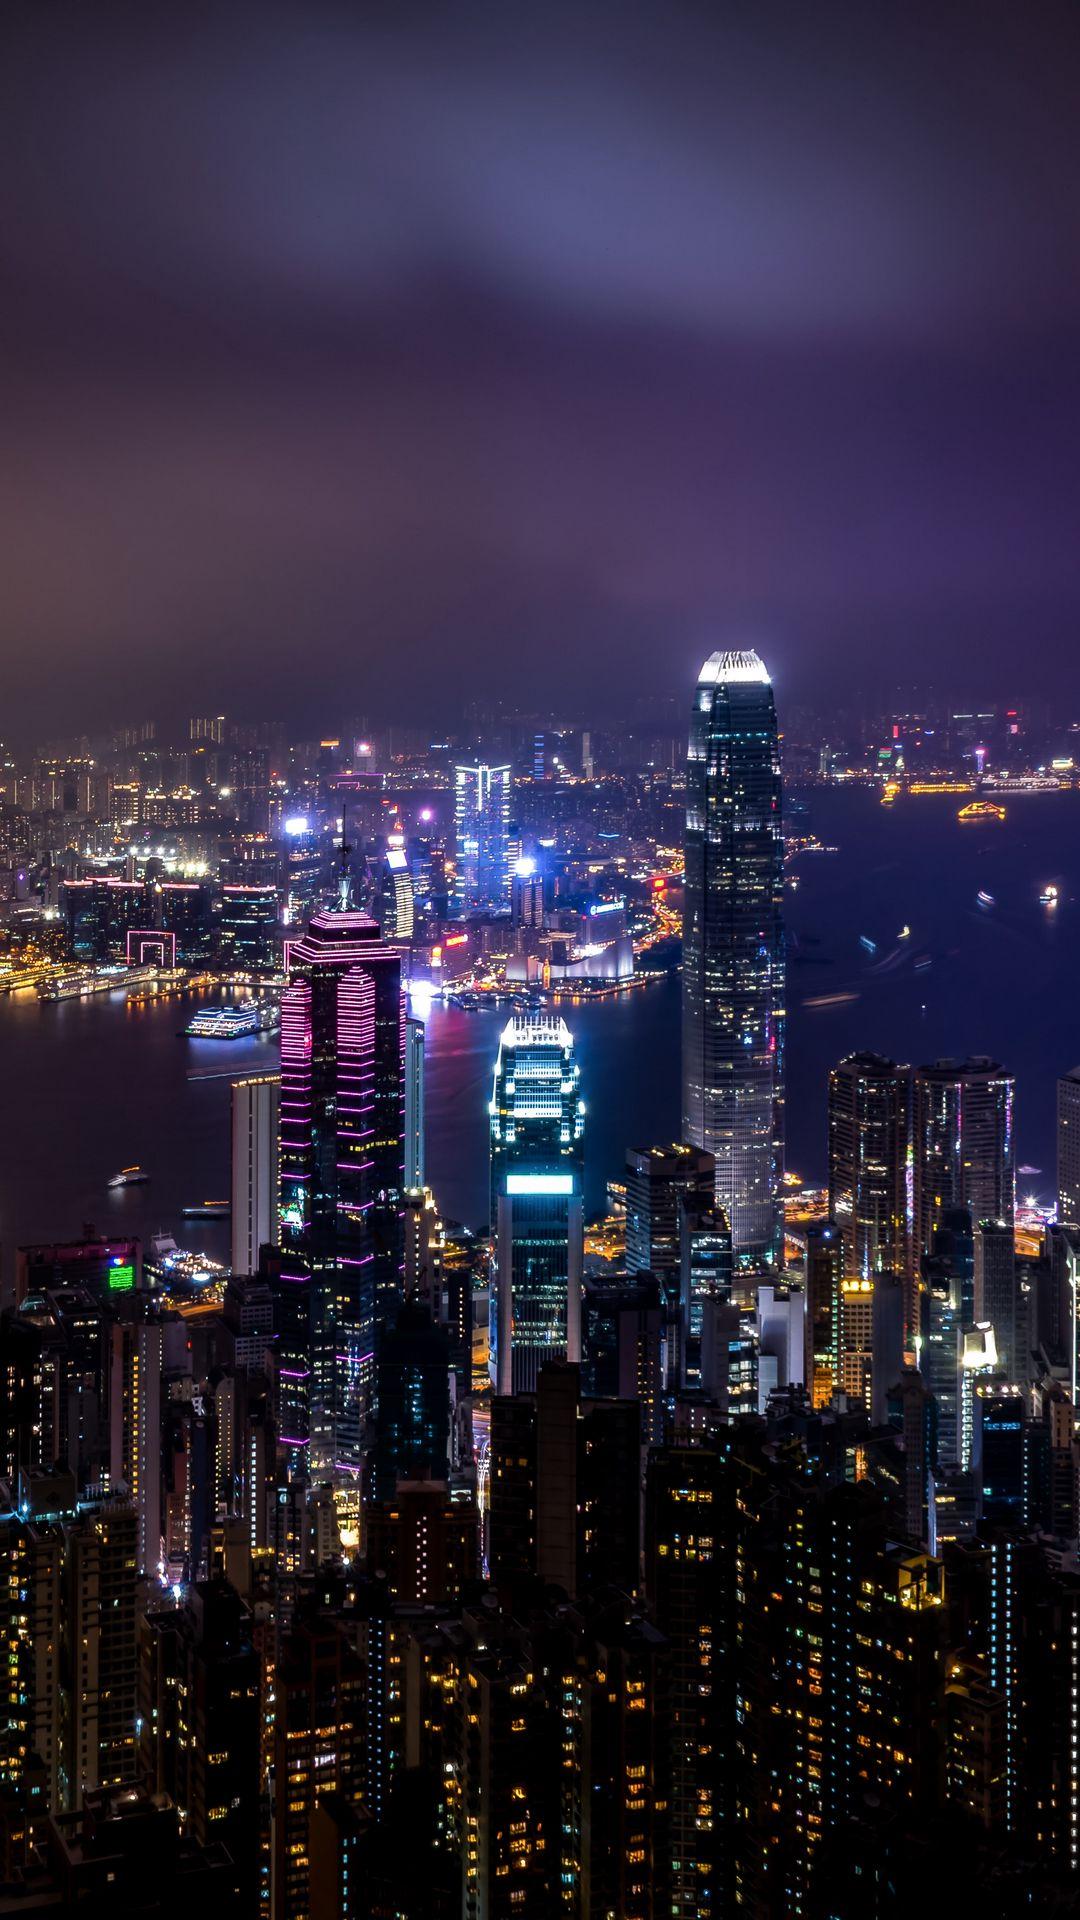 1080x1920 Wallpaper hong kong, china, skyscrapers, night city, city lights